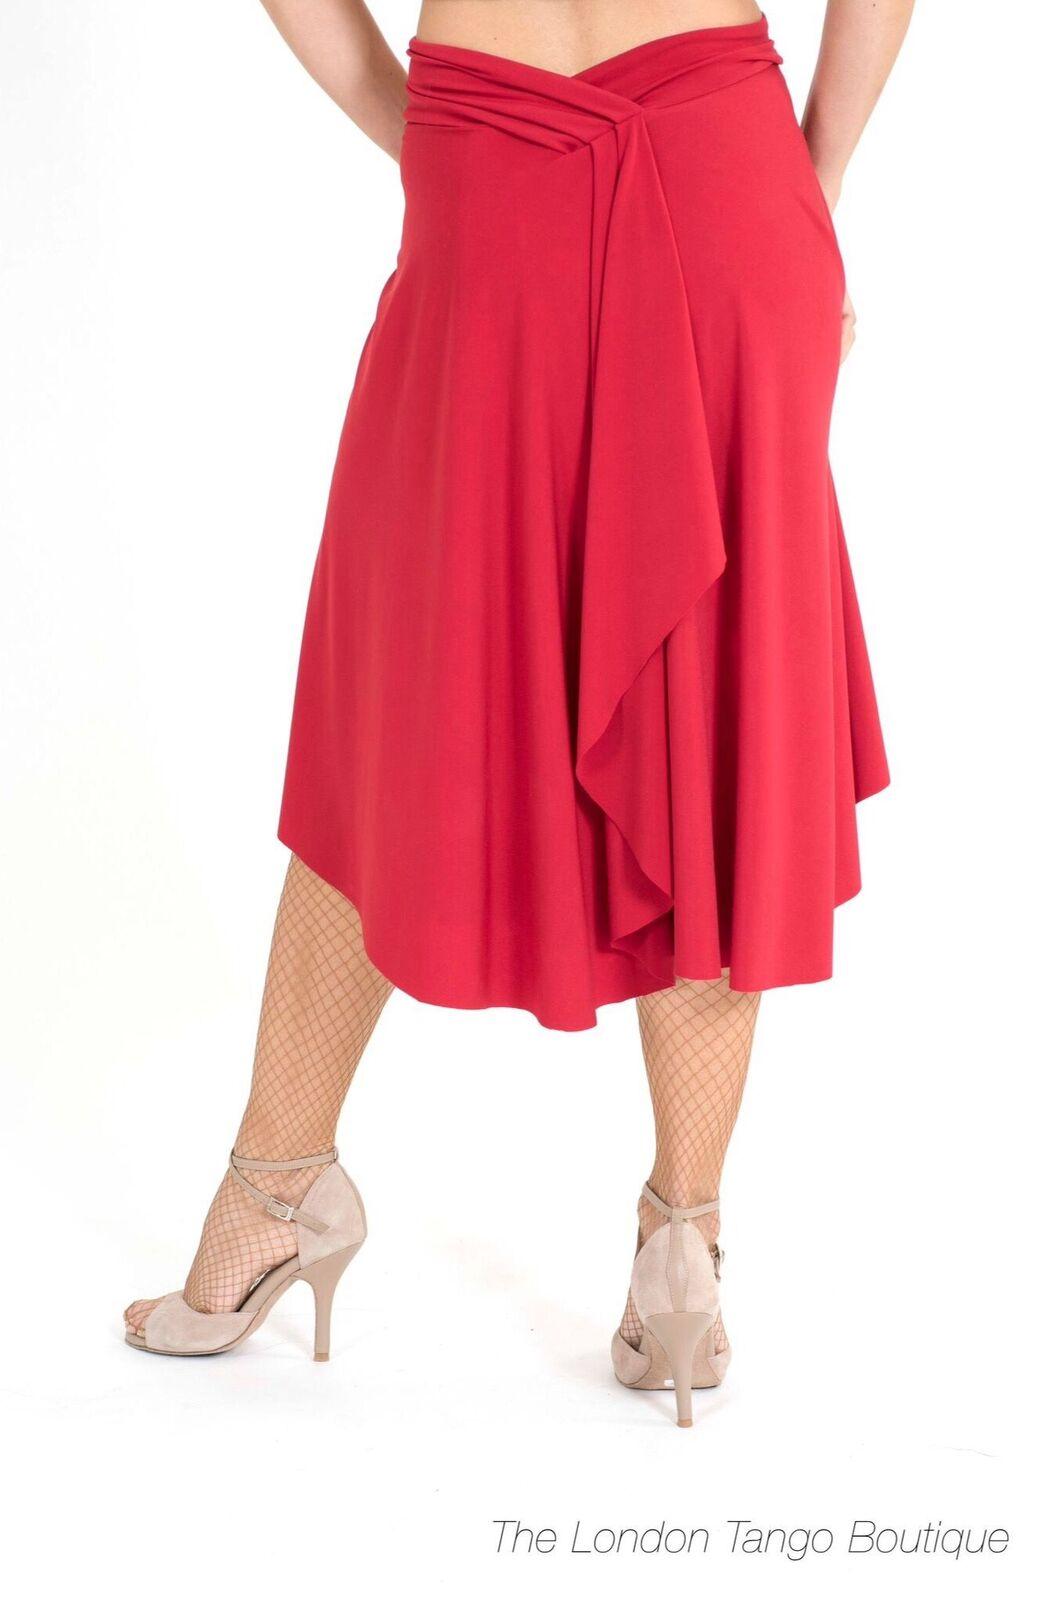 A draped argentine tango skirt